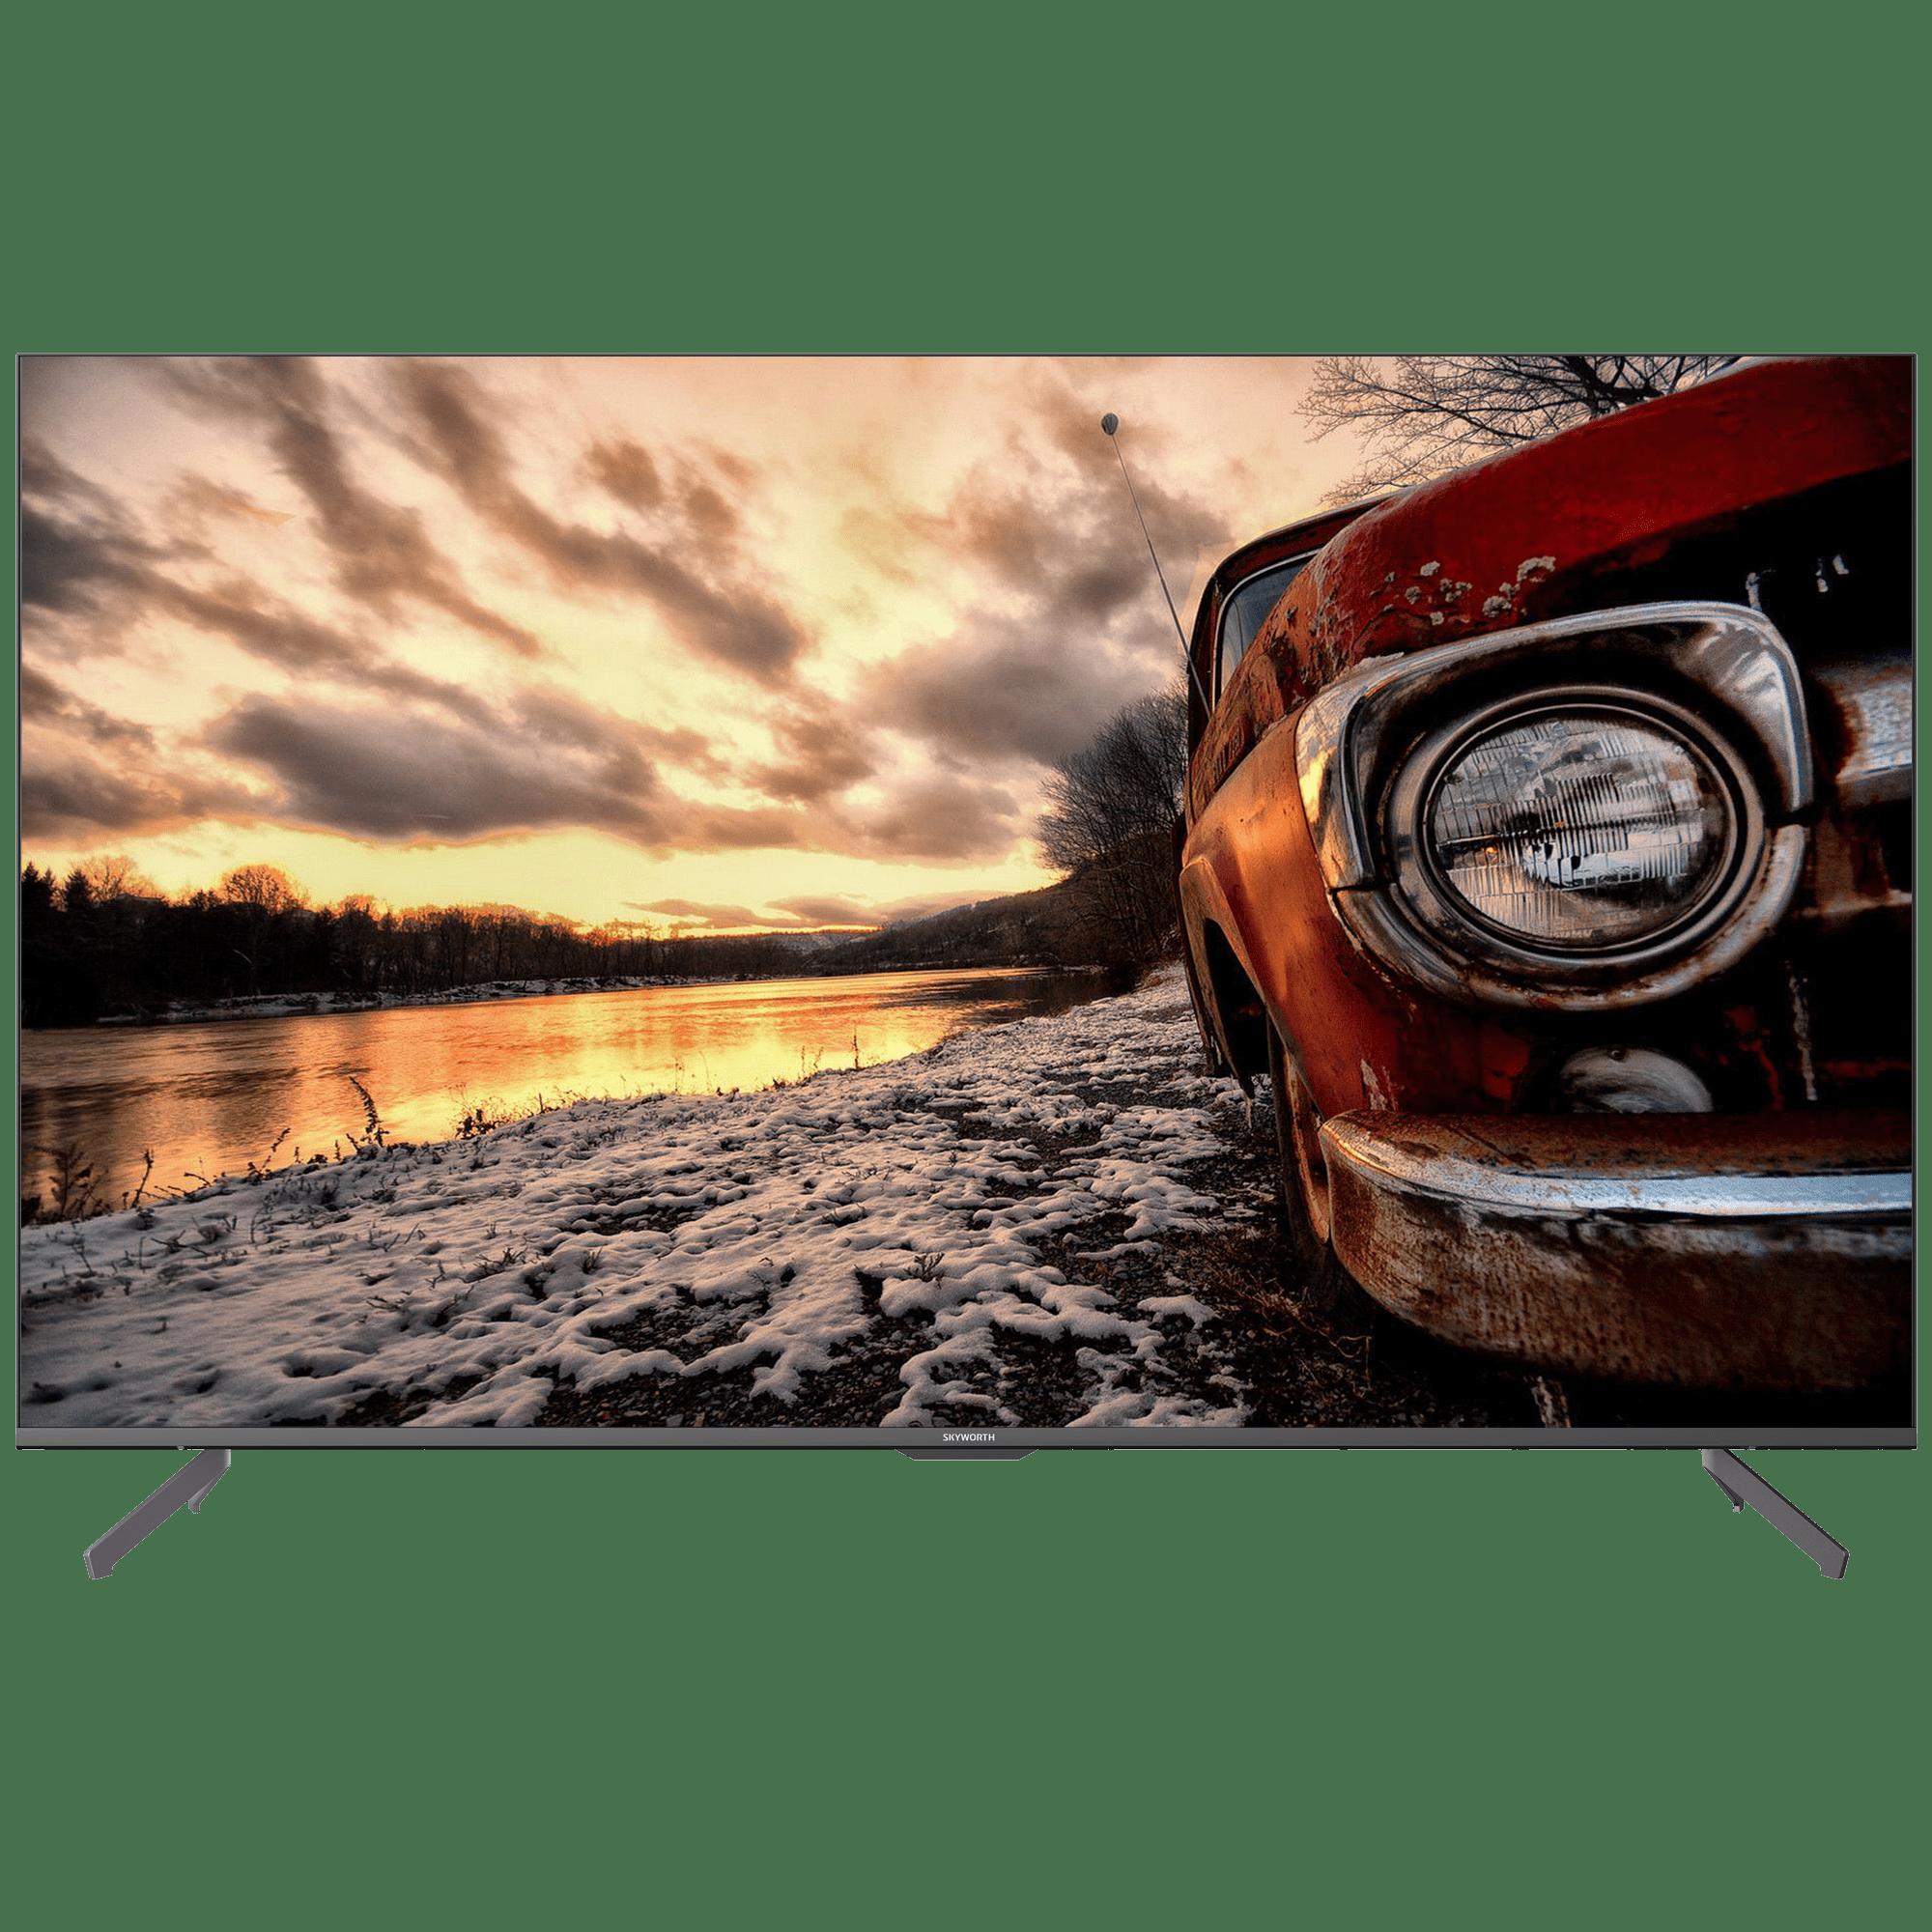 Panasonic Viera 165cm (65 Inch) Ultra HD 4K LED Android Smart TV (Built-in Chromecast, TH-65JX750DX, Black)